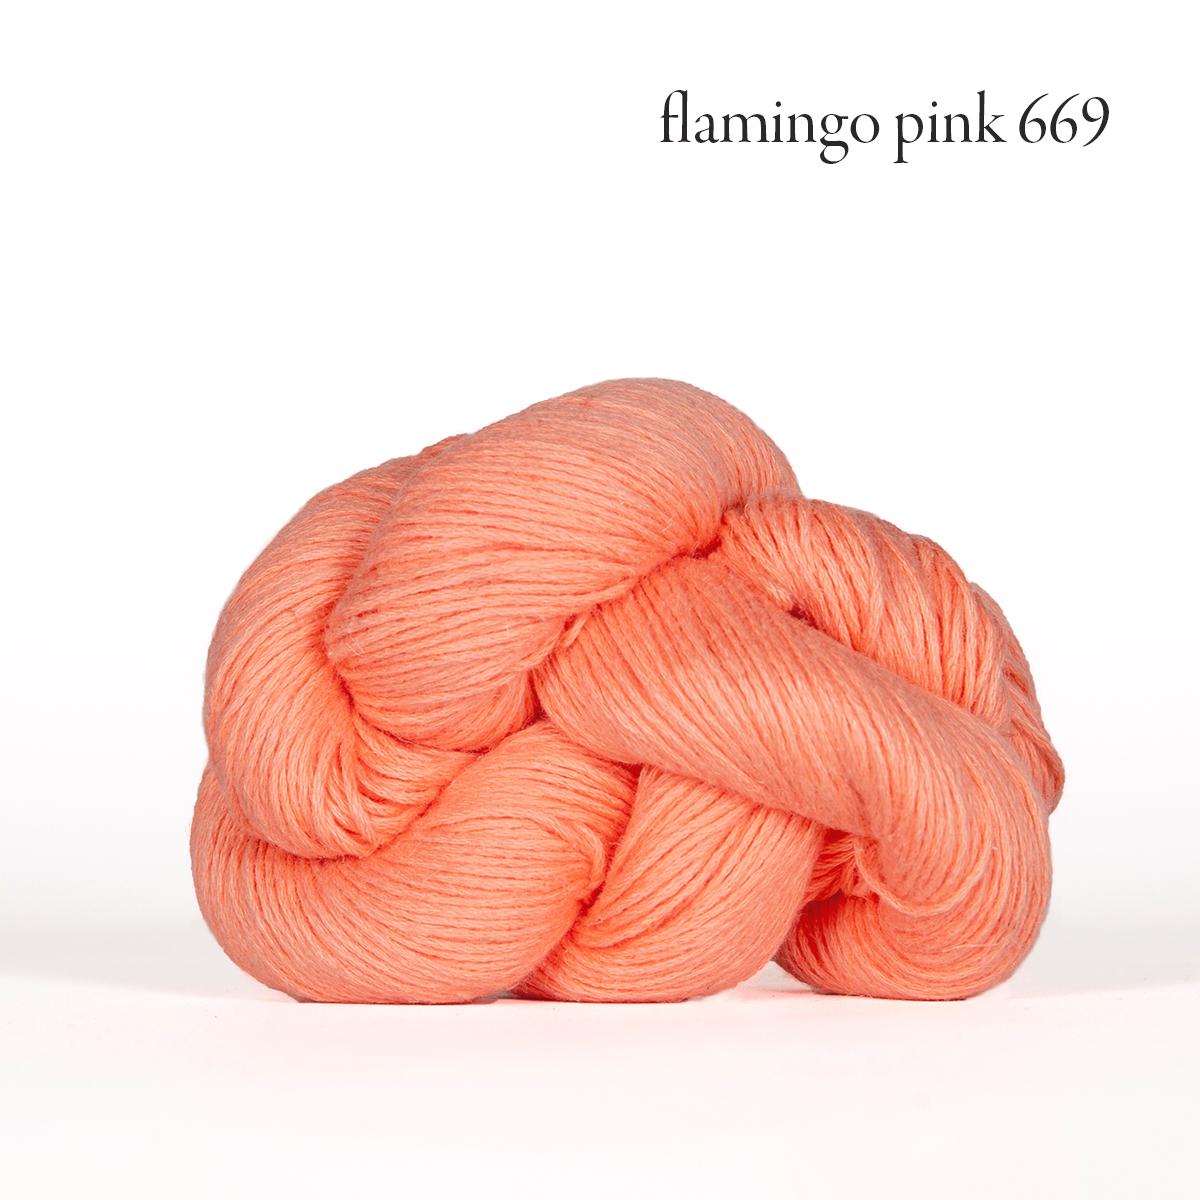 mojave flamingo pink 669.jpg